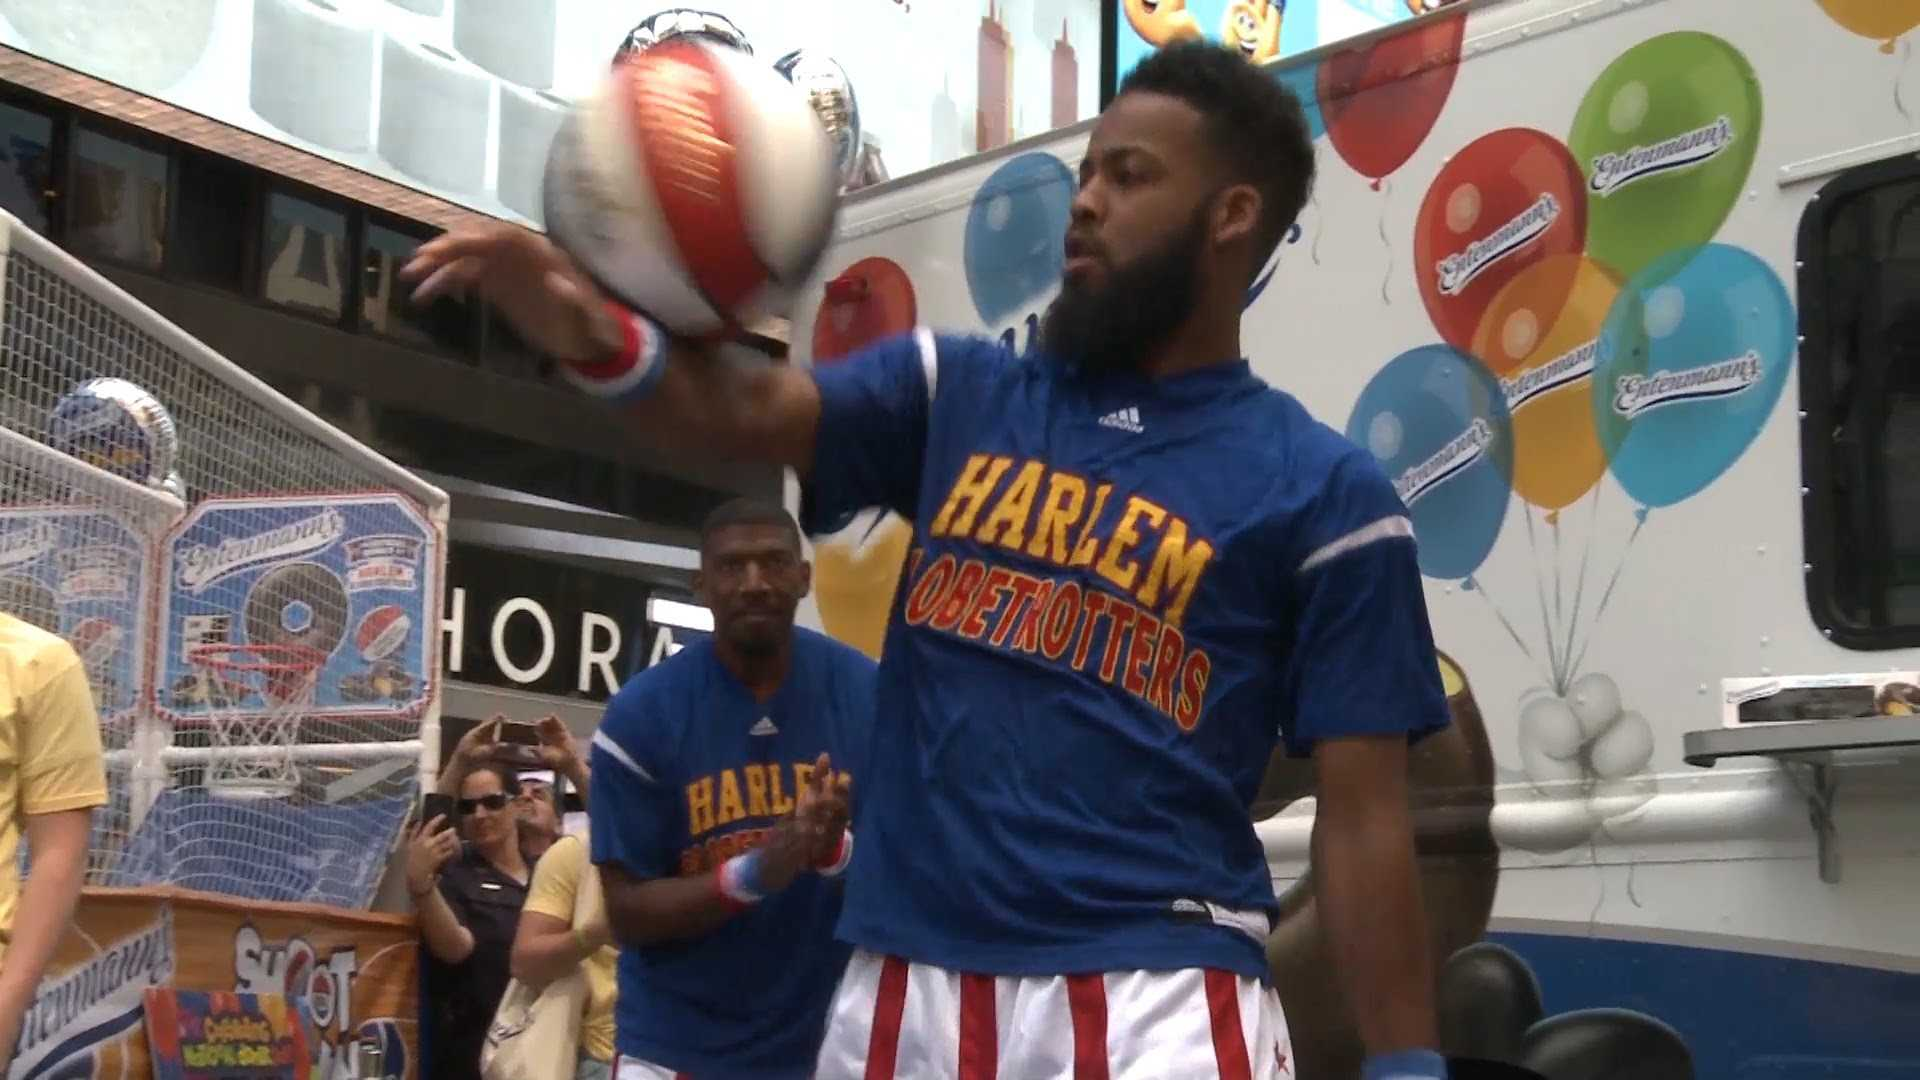 The Harlem Globetrotters Celebrate National Donut Day